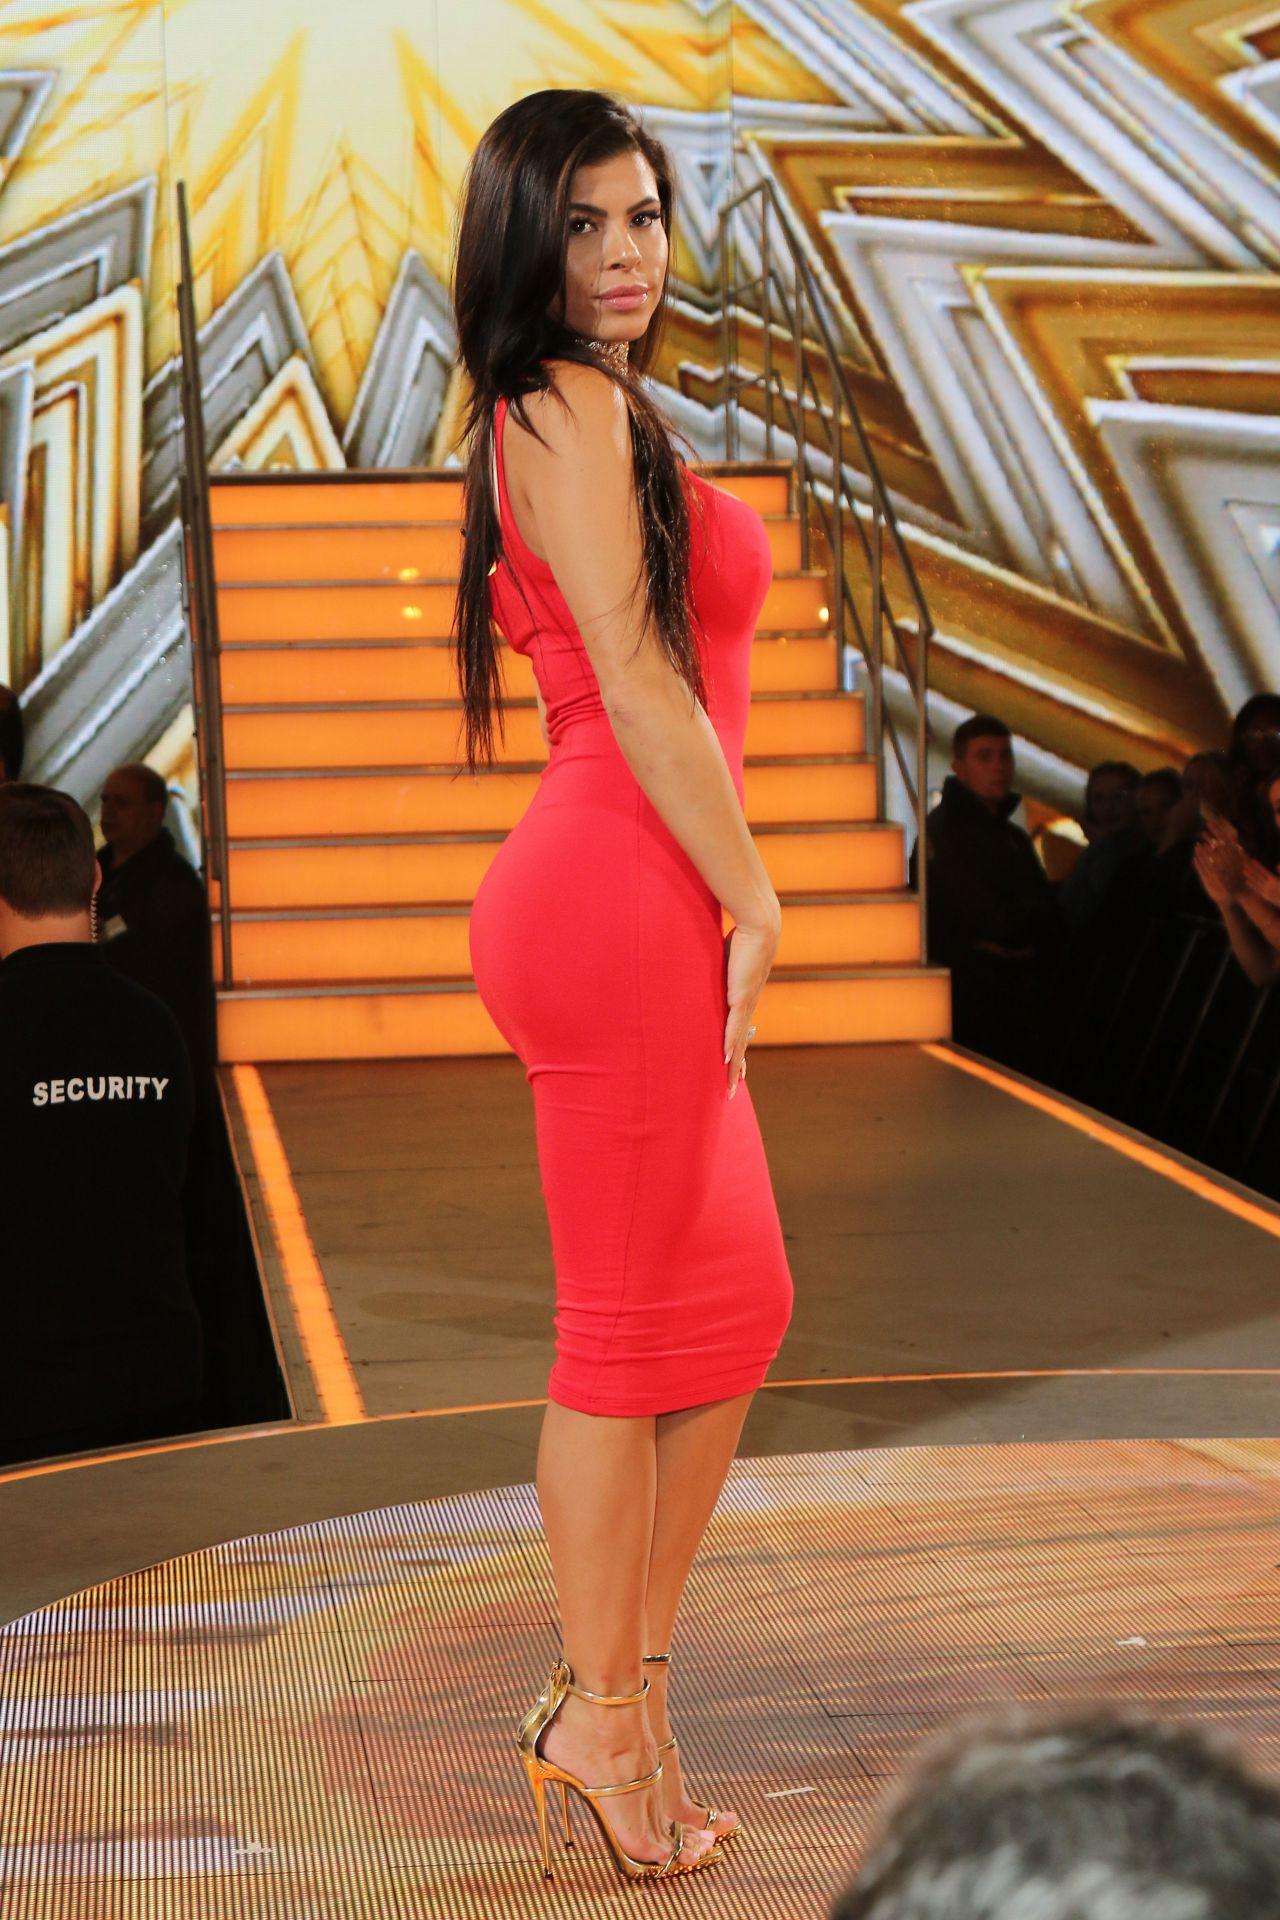 Big Brother (UK TV series) - Wikipedia